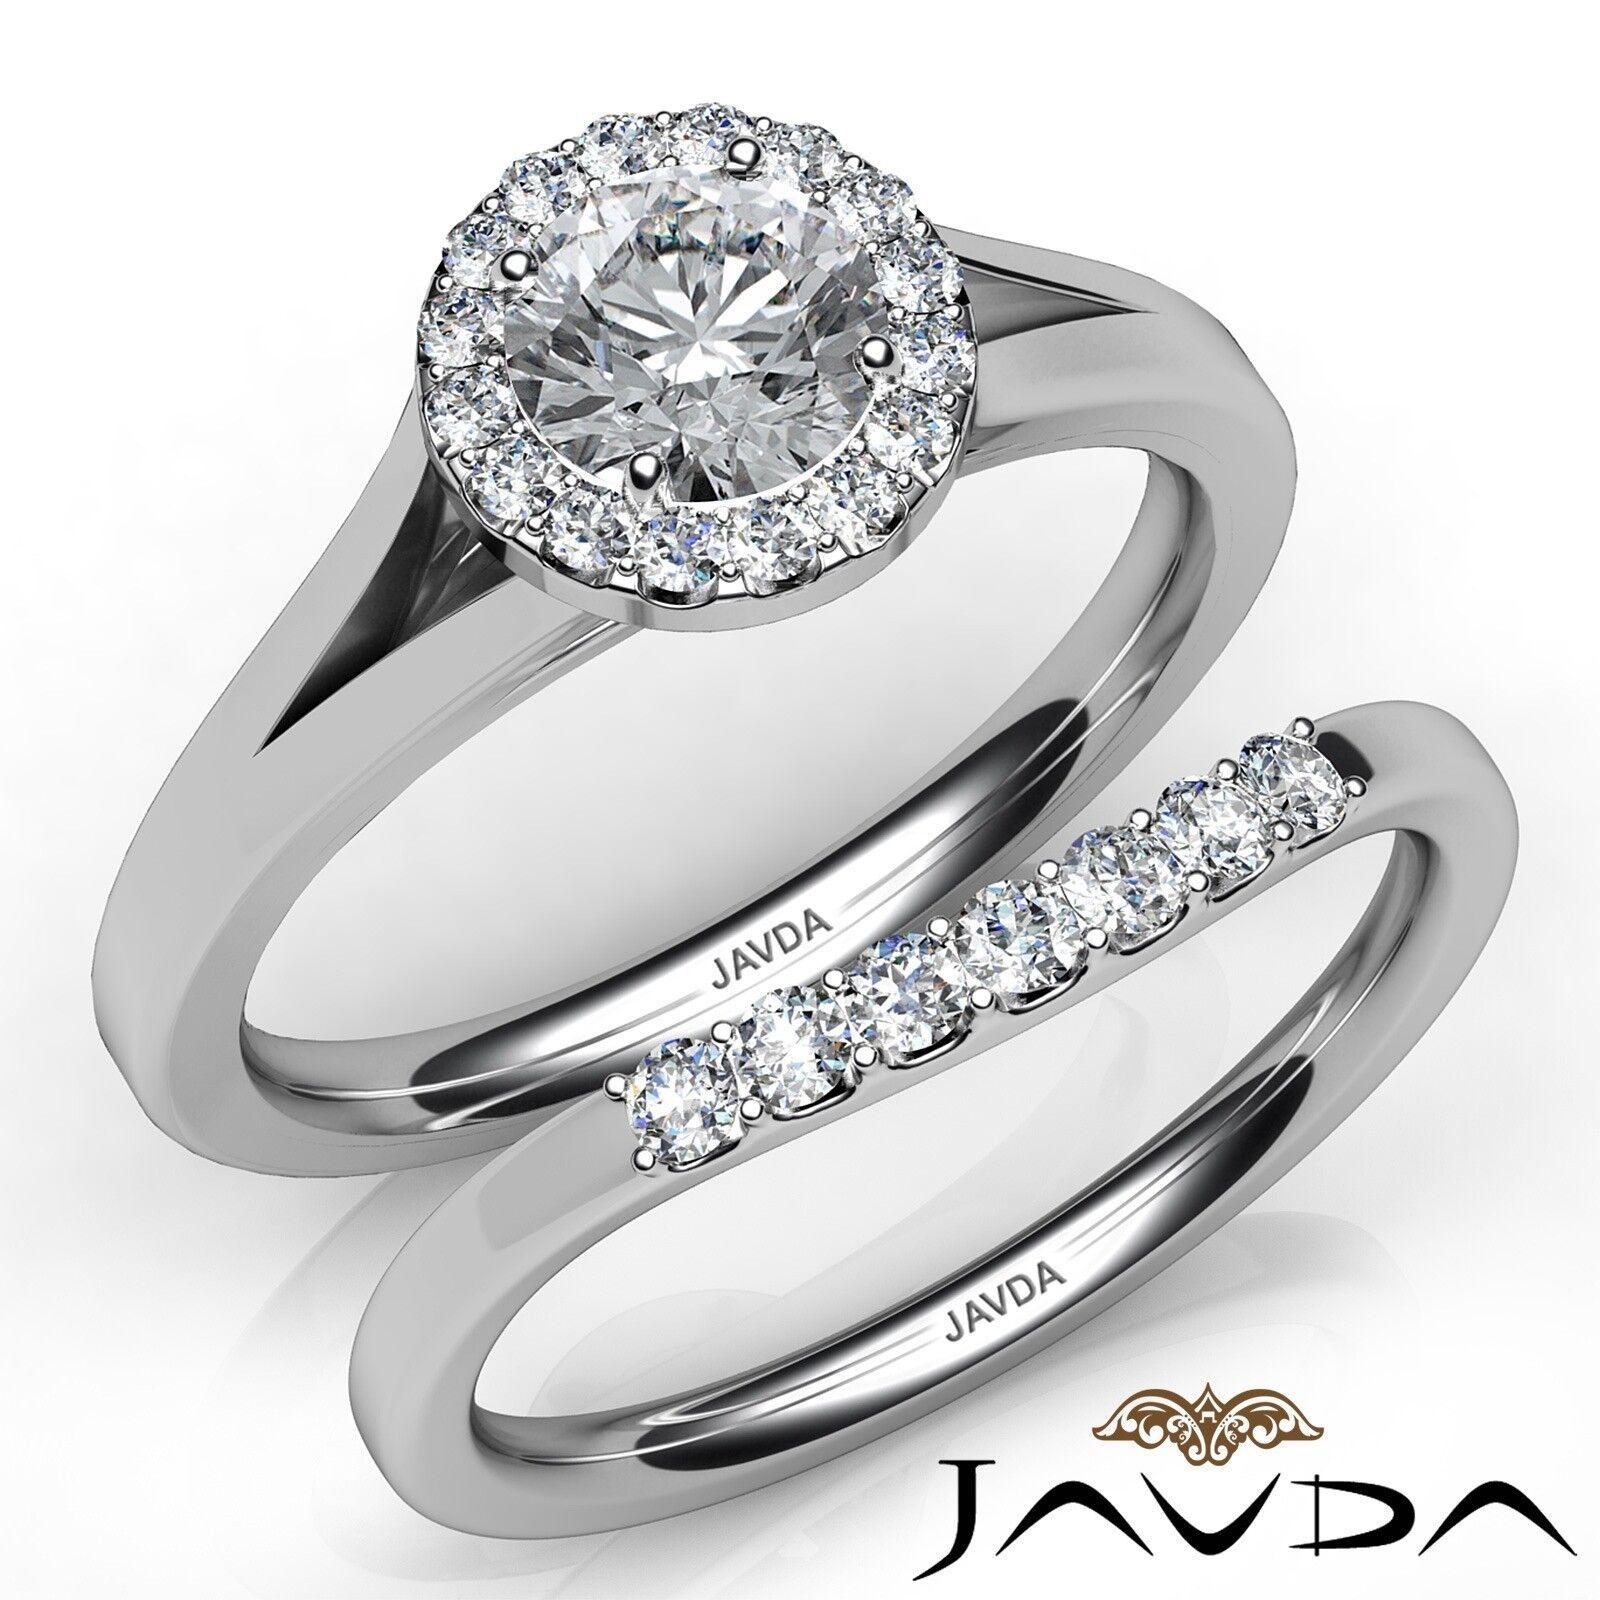 1.17ctw Classic Bridal Halo Pave Round Diamond Engagement Ring GIA J-VS1 W Gold